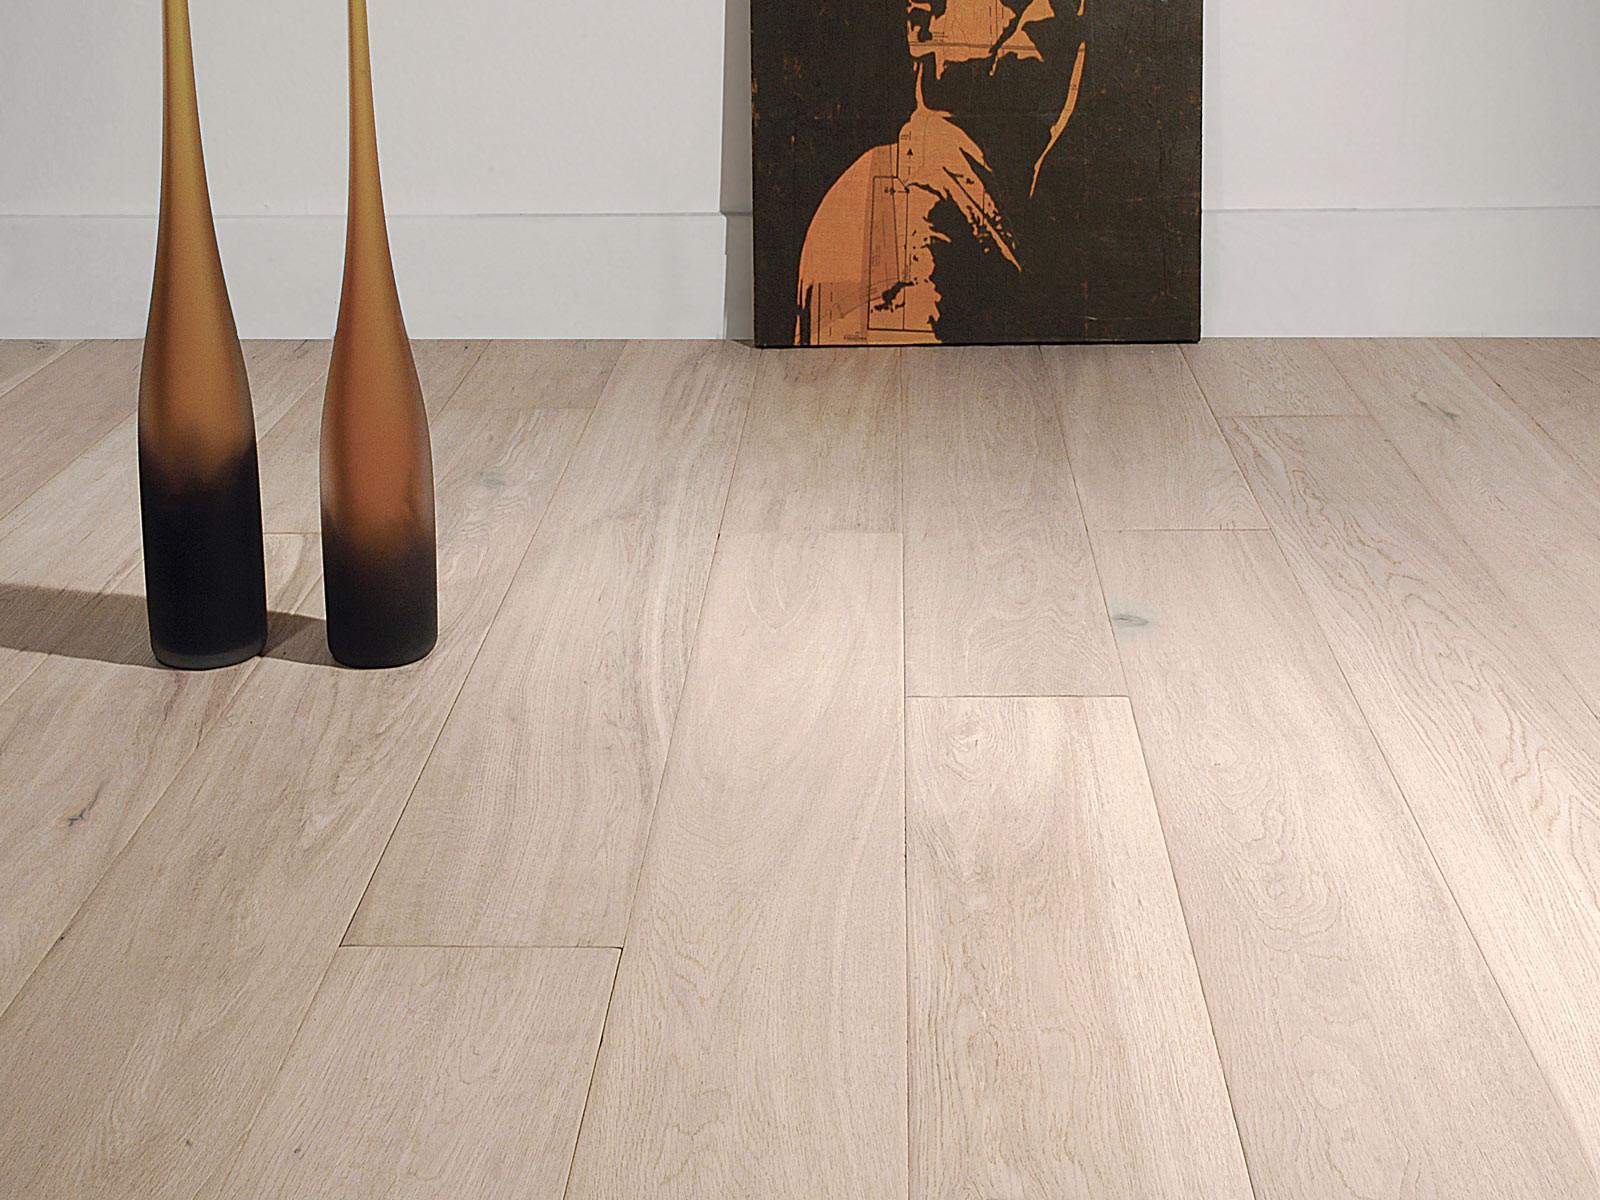 12 Lovely Vintage Hardwood Flooring Reviews 2021 free download vintage hardwood flooring reviews of duchateau hardwood flooring houston tx discount engineered wood for white oiled